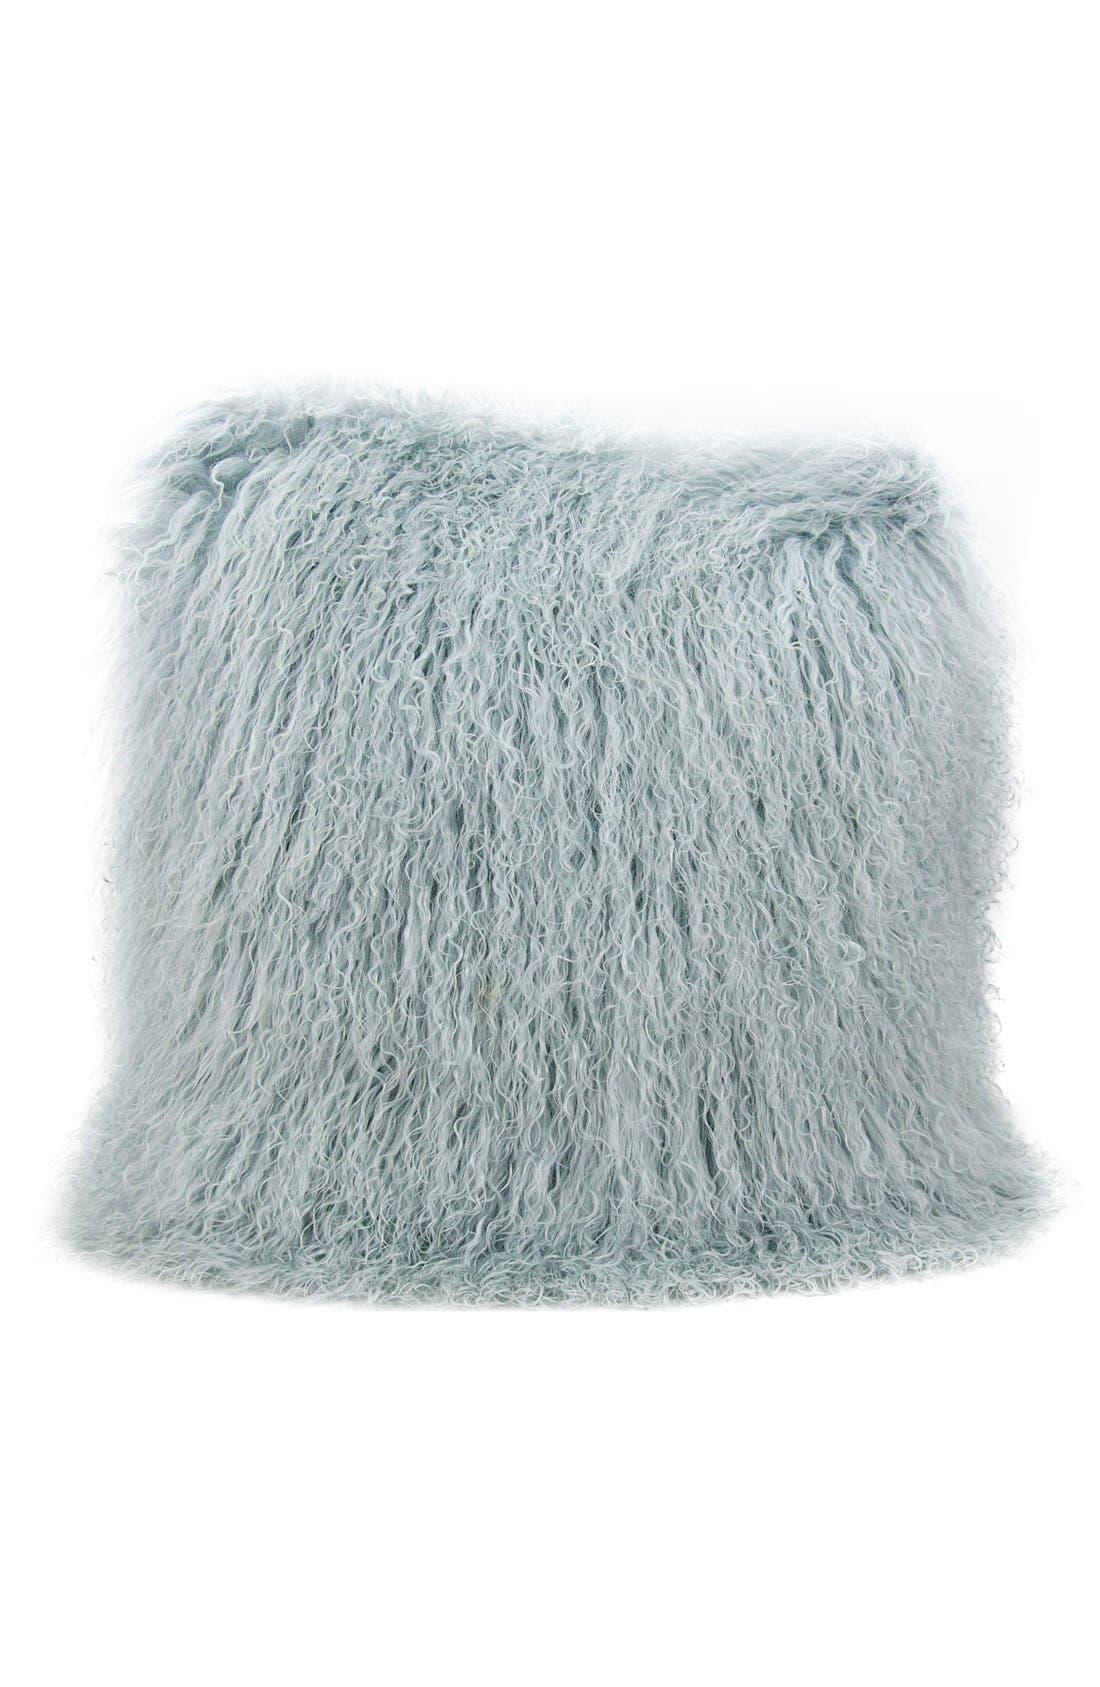 Alternate Image 1 Selected - Mina Victory Genuine Tibetan Wool Shearling Pillow